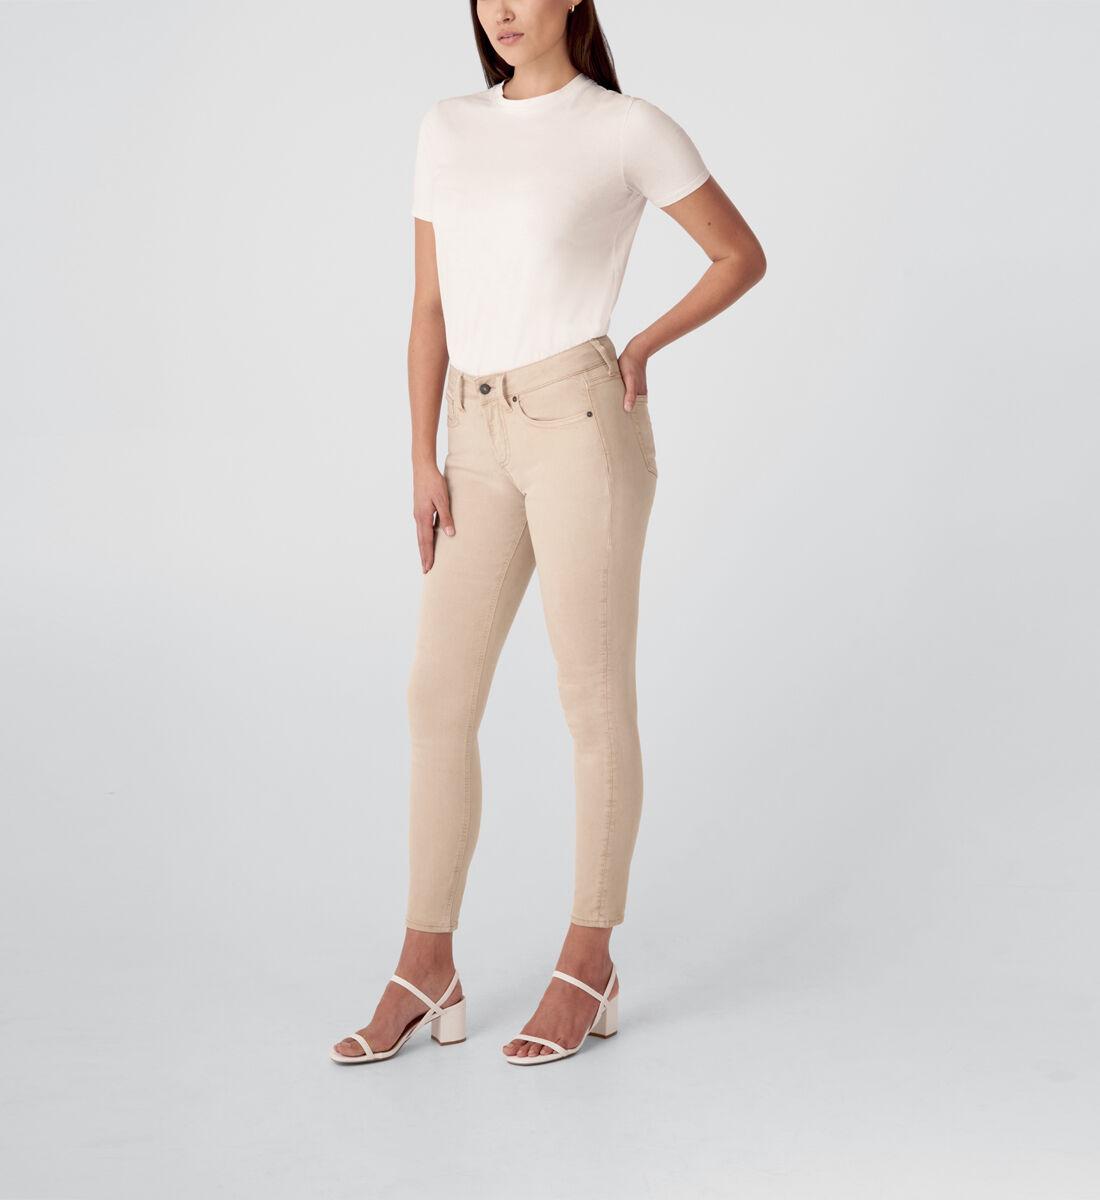 Suki Mid Rise Skinny Jeans,Tan Side